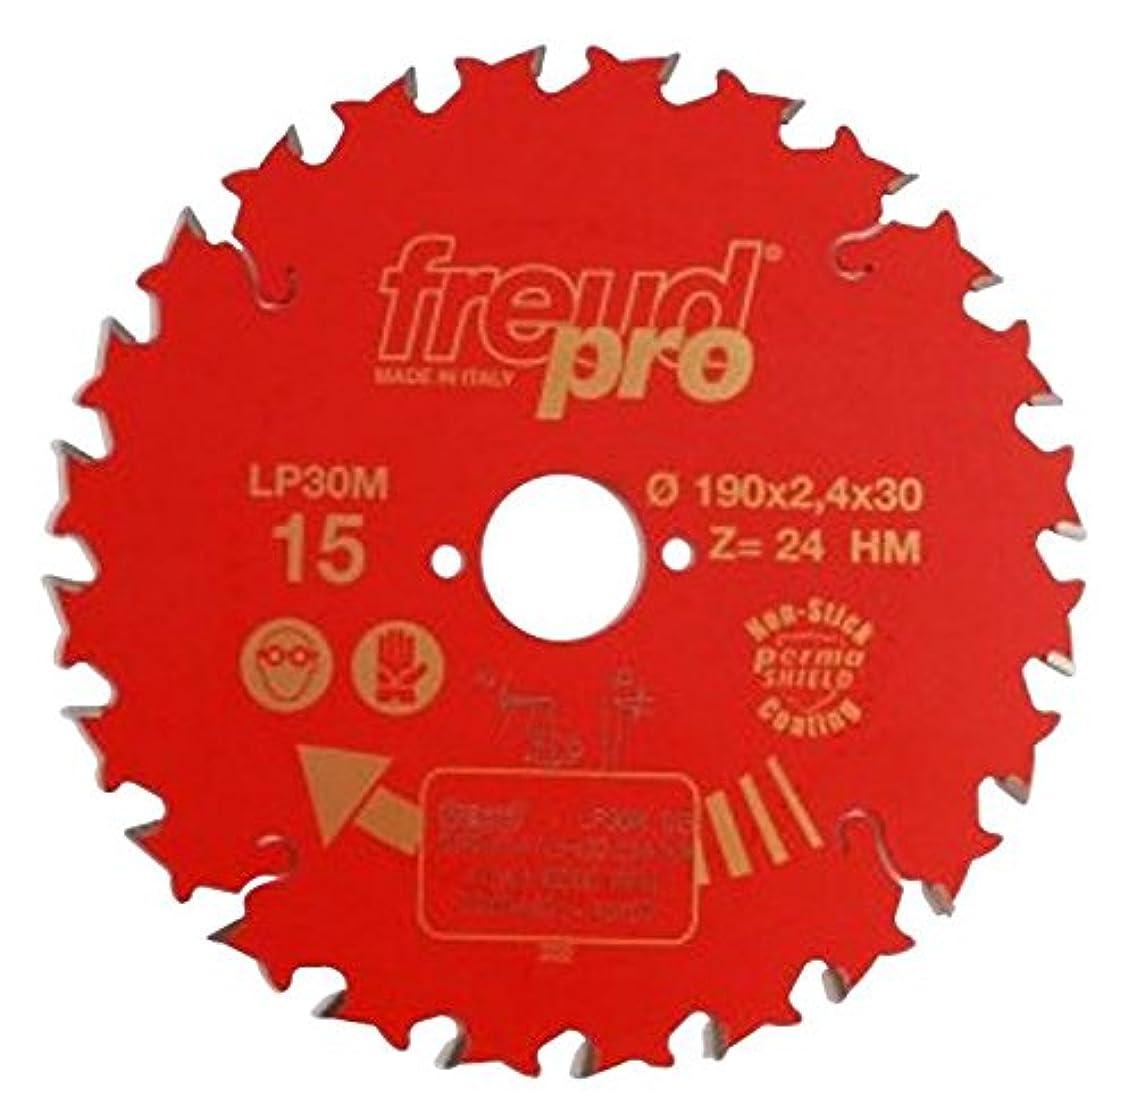 GENERAL PURPOSE SAW BLADE 250X30X40T Blade Diameter 250mm Saw Type Circular Bore Size 30mm TPI (f) 4